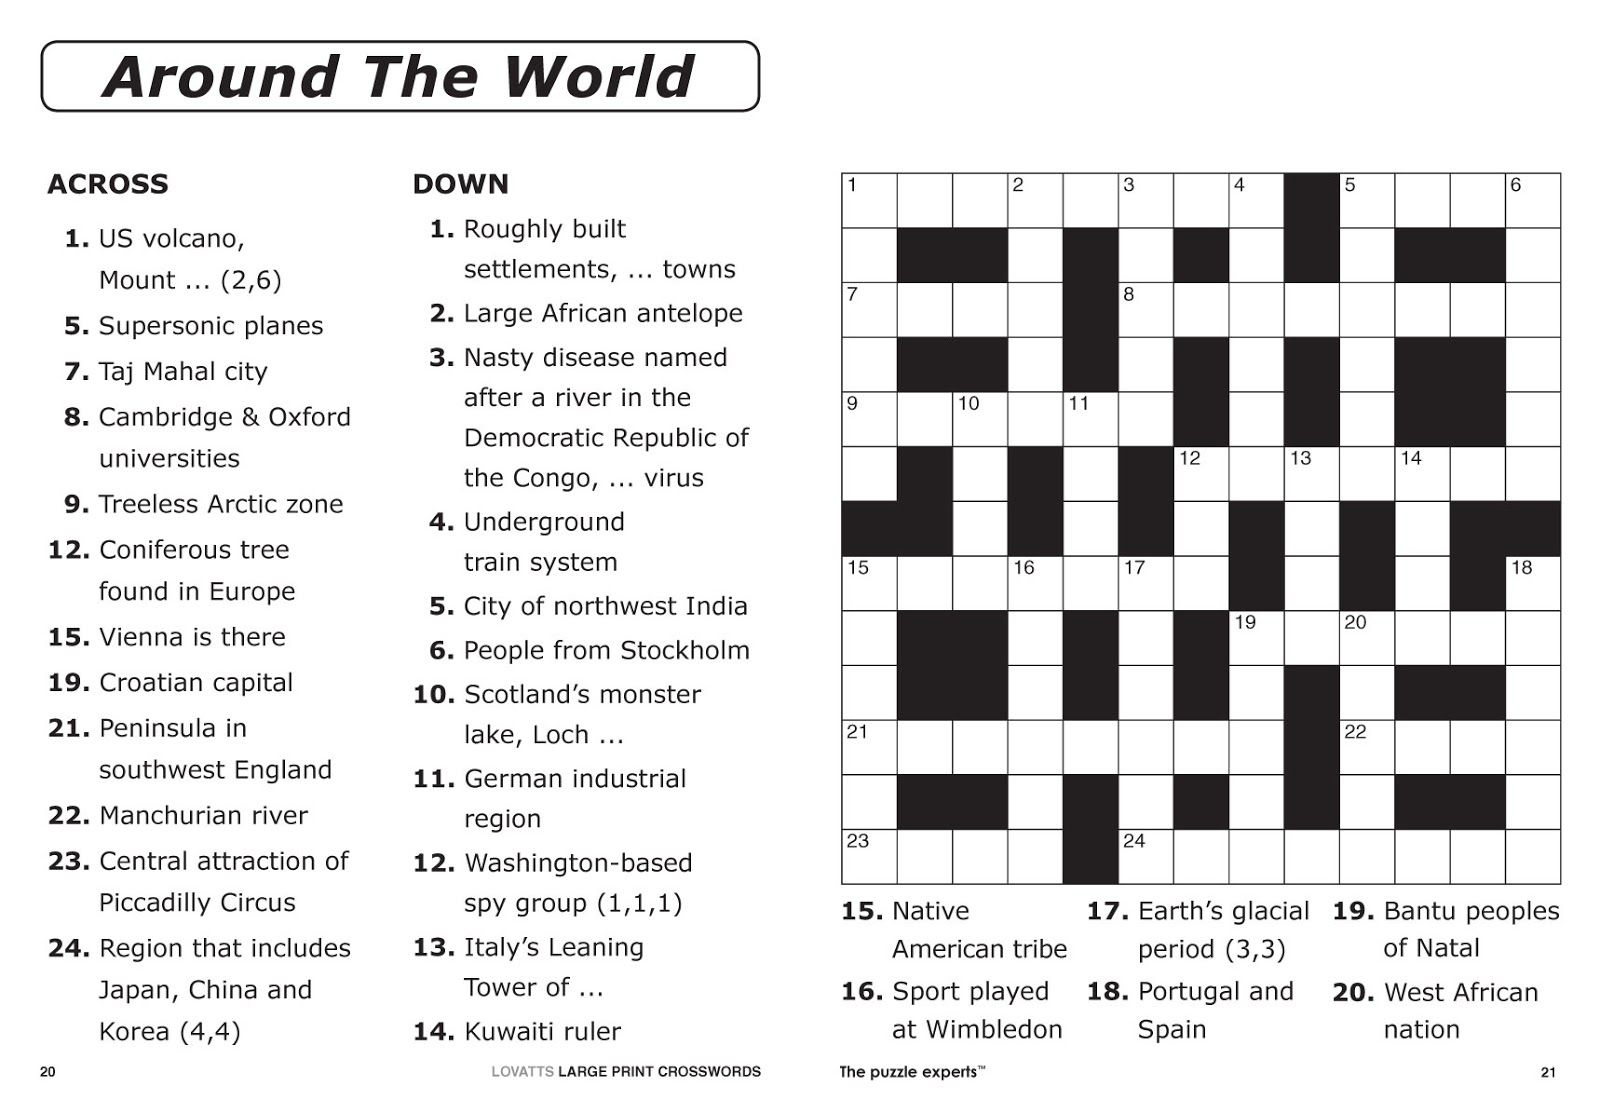 Easy Printable Crossword Puzzles   Elder Care & Dementia Care - Large Print Crossword Puzzle Books For Seniors